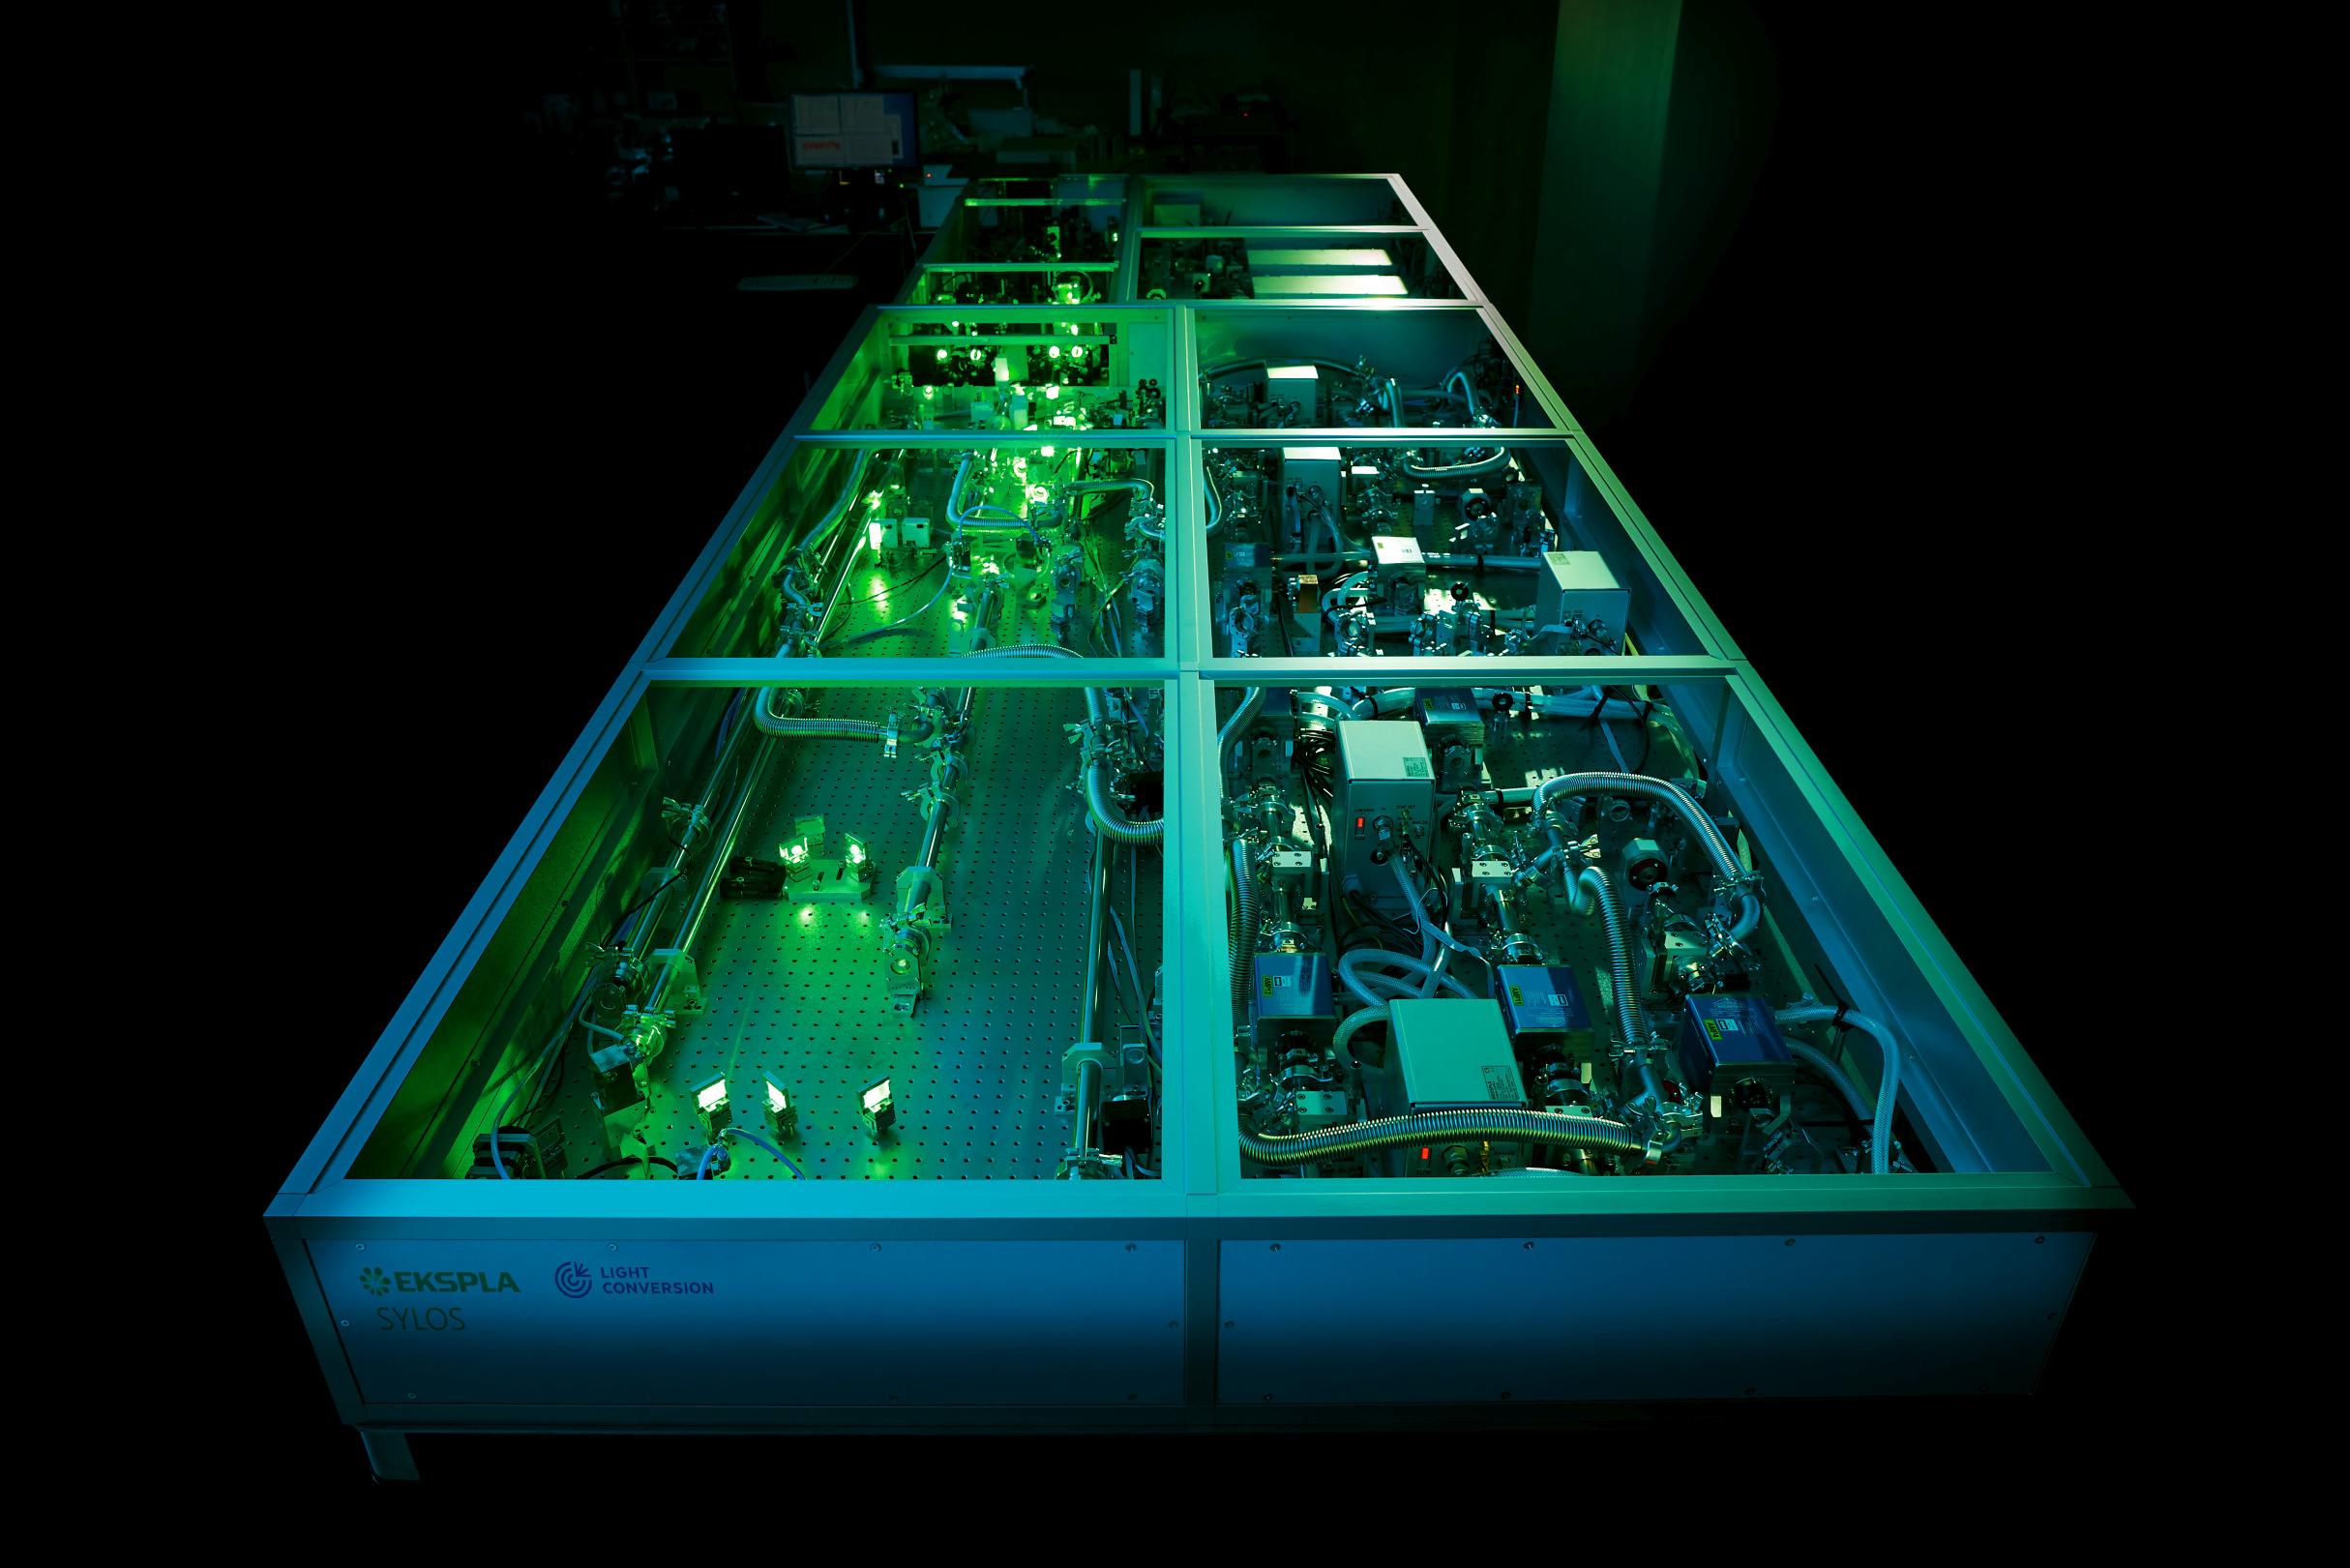 OPCPA-laser-system-sylos3.jpg (905 KB)